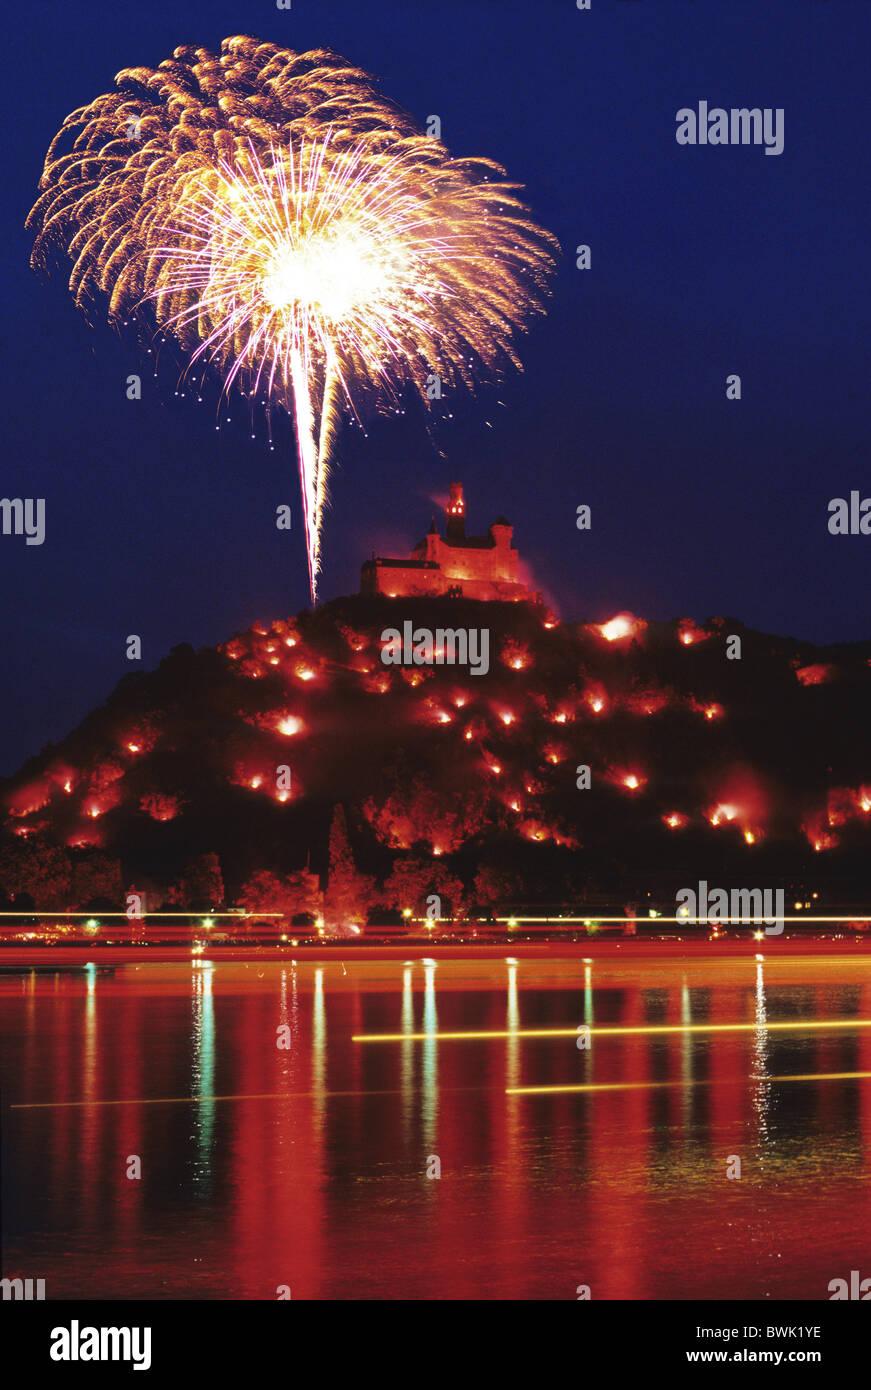 Fireworks near Marksburg castle, Rhein in Flammen, near Koblenz, Rhine, Rhineland-Palatinate, Germany - Stock Image